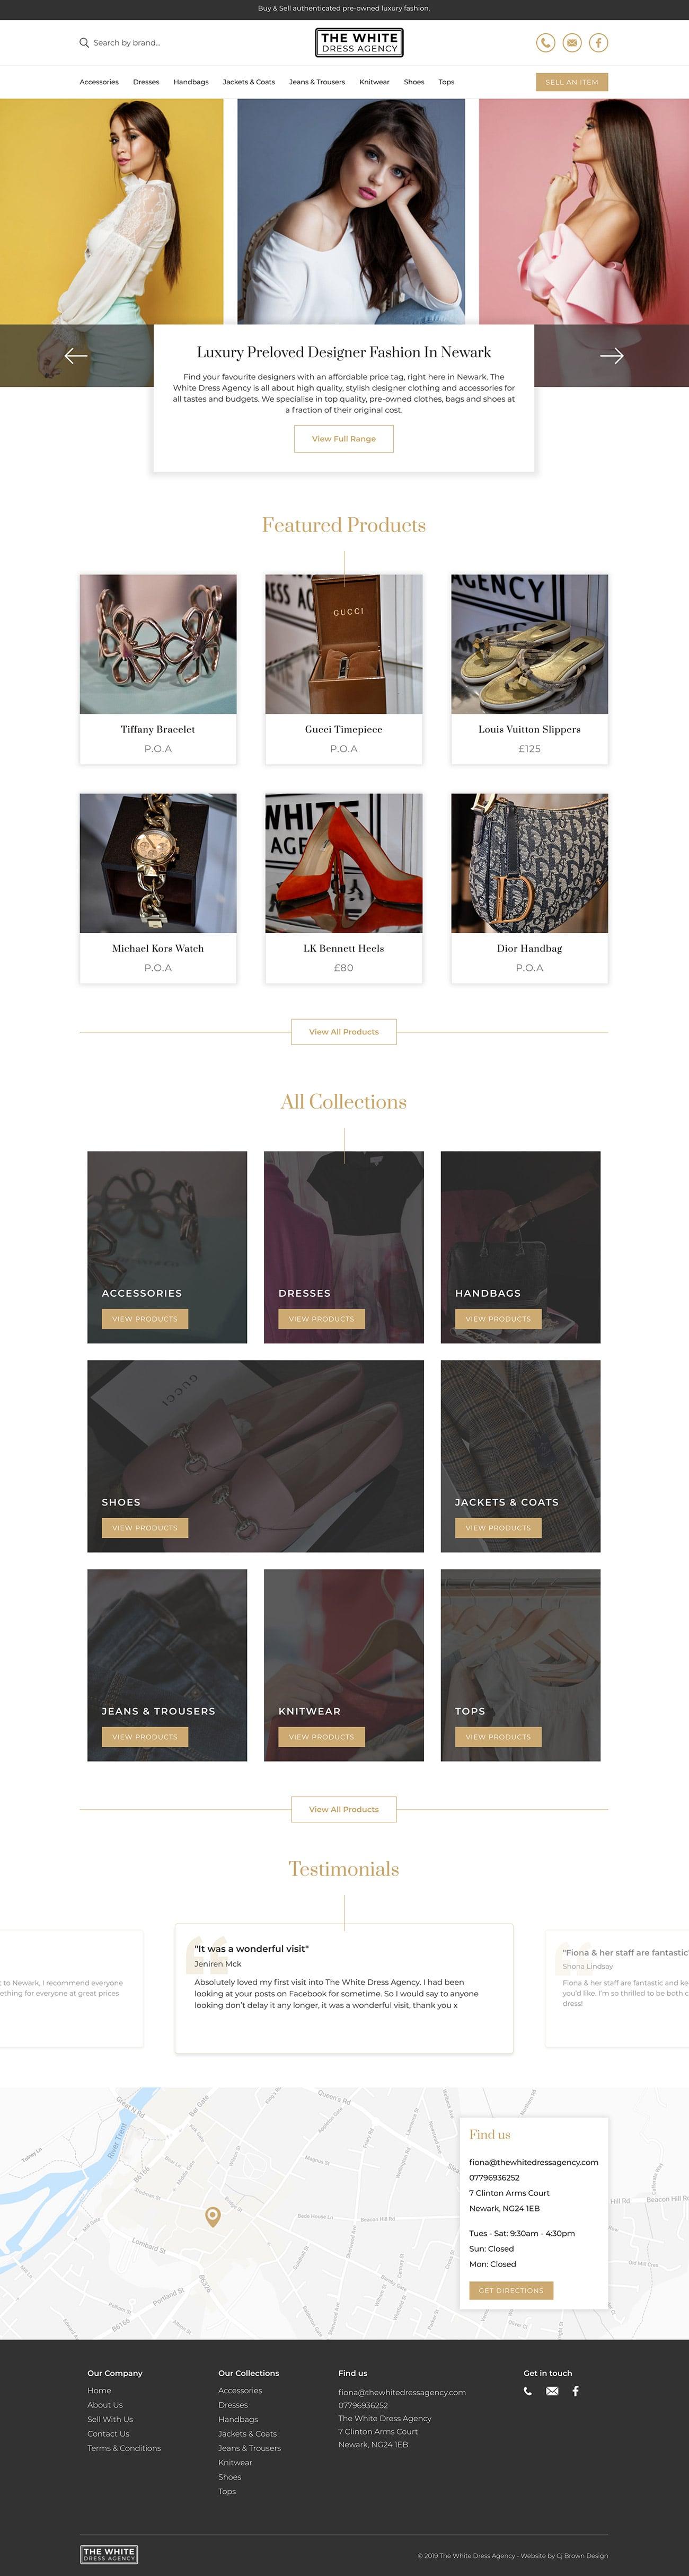 Web Design Grantham